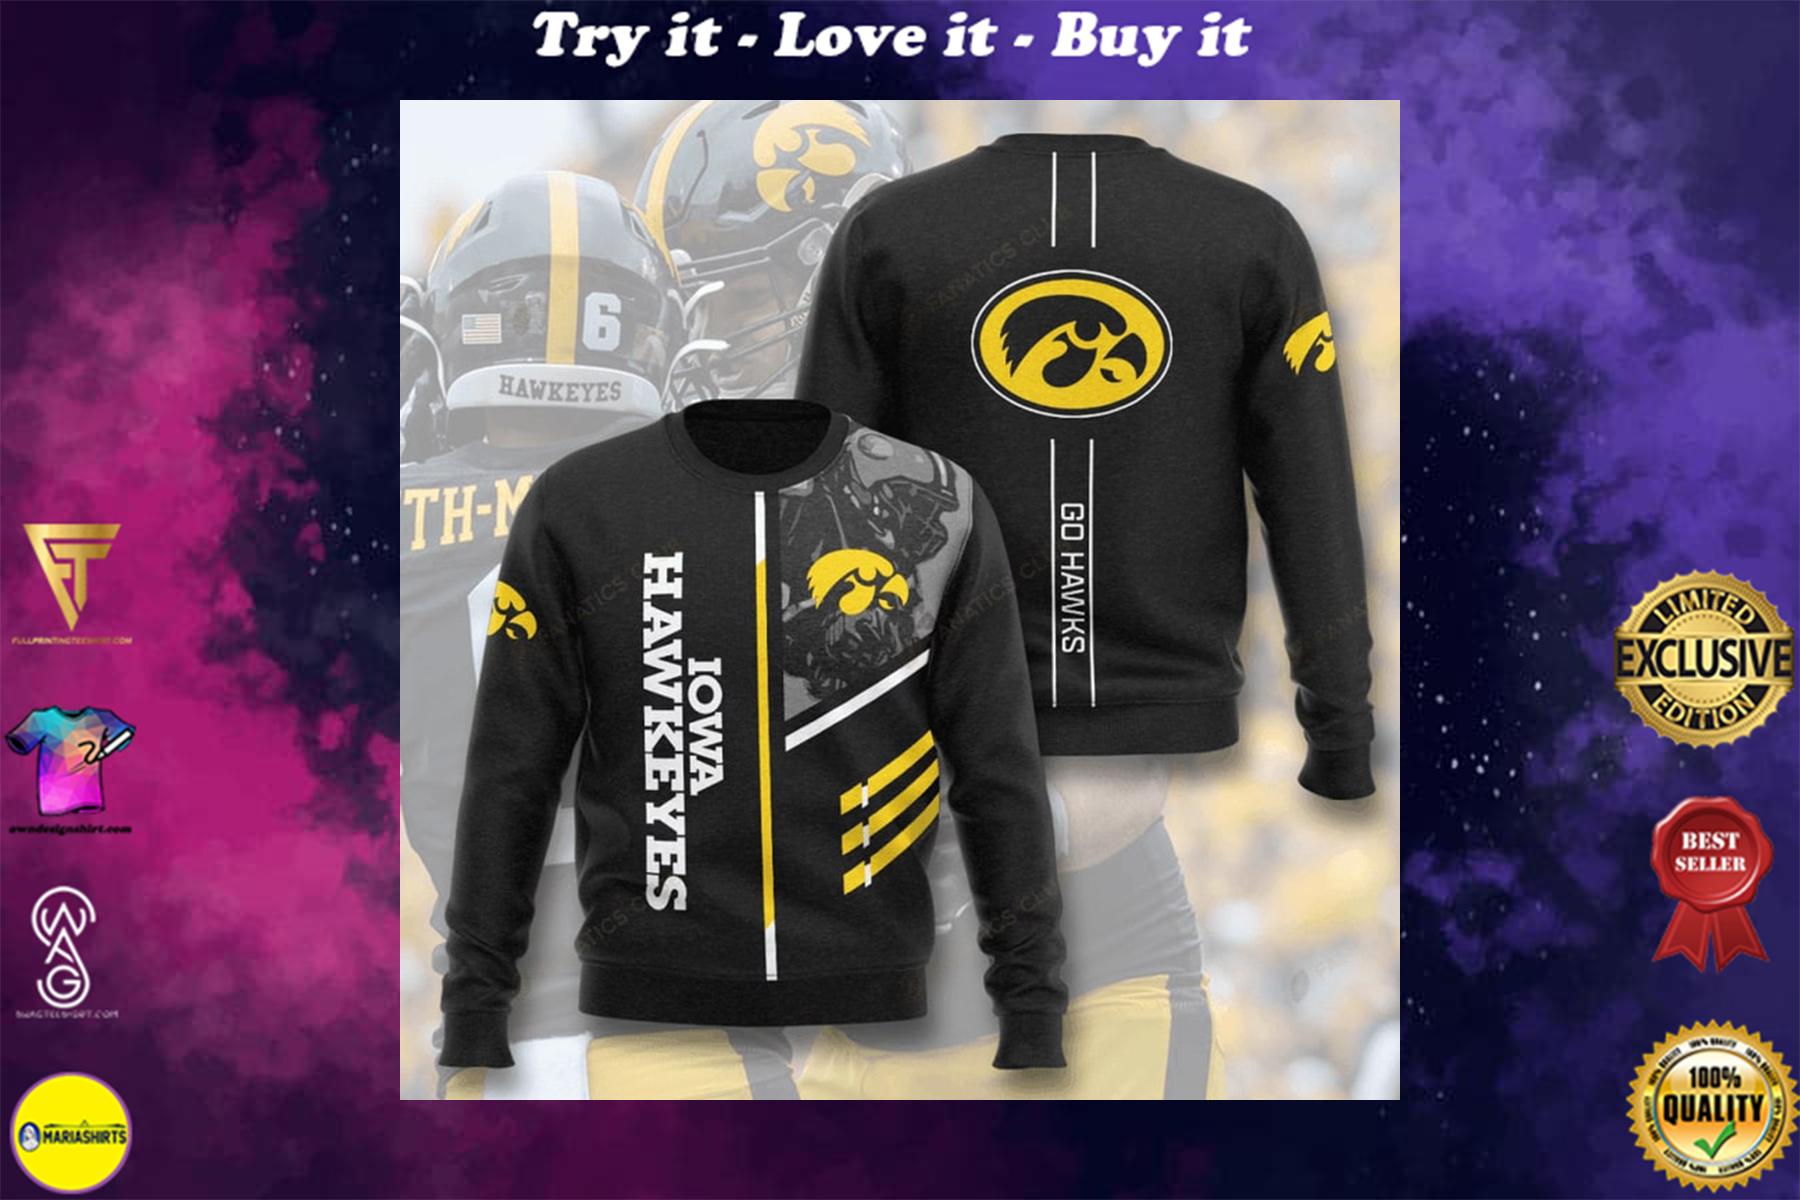 [special edition] iowa hawkeyes football go hawks full printing ugly sweater - maria